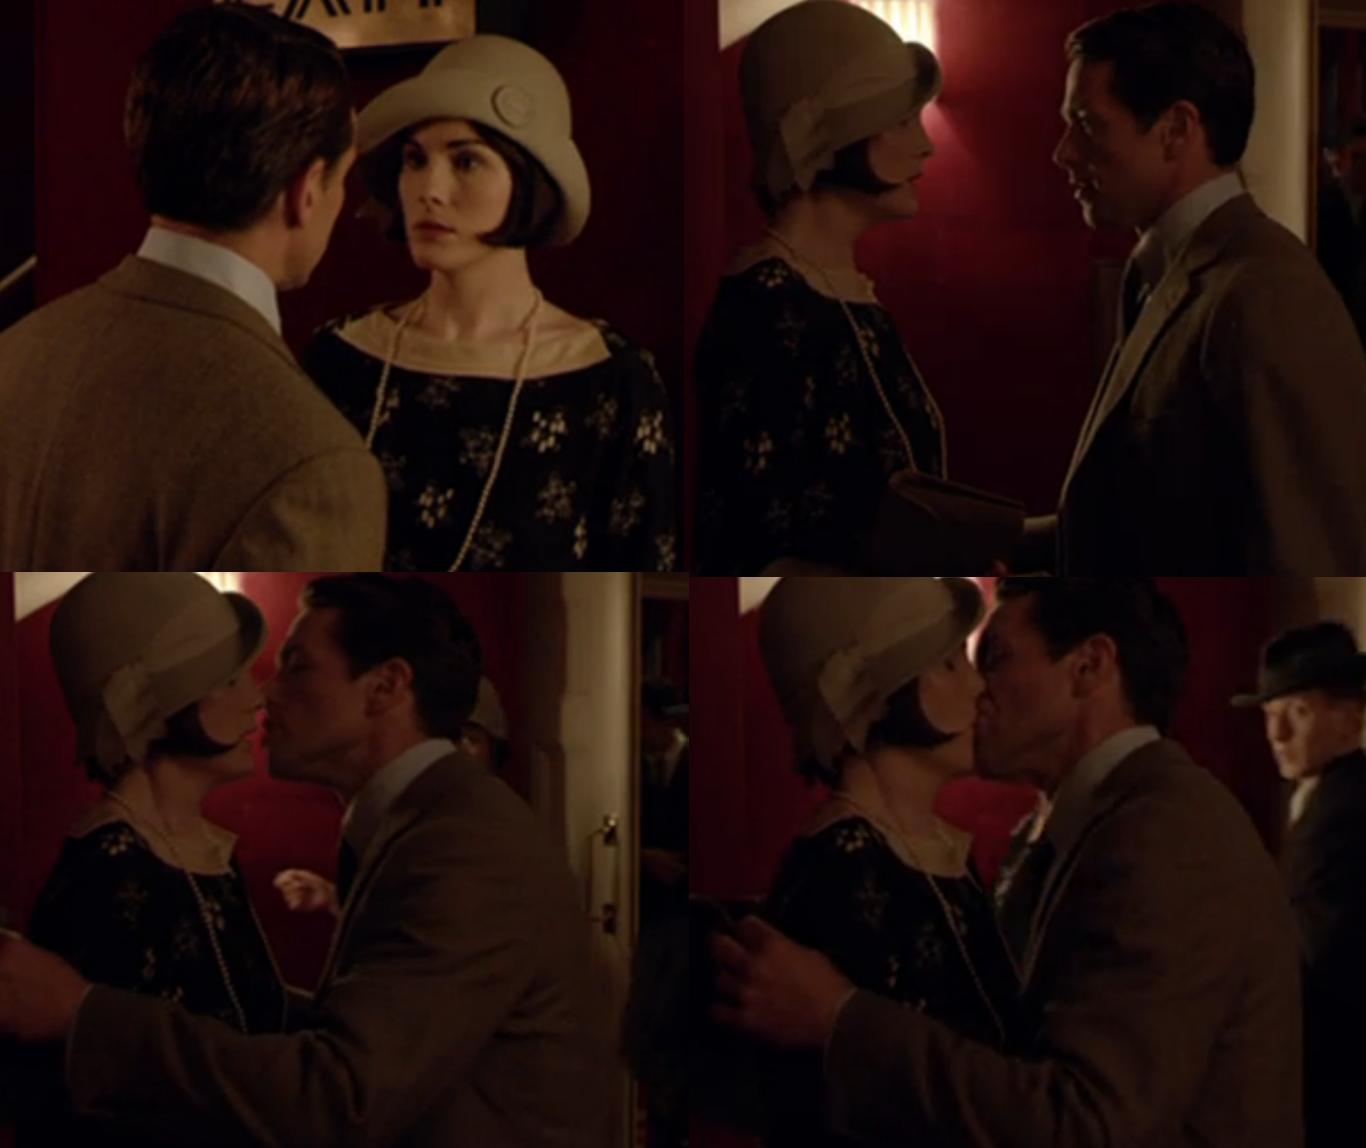 Blake kisses Mary